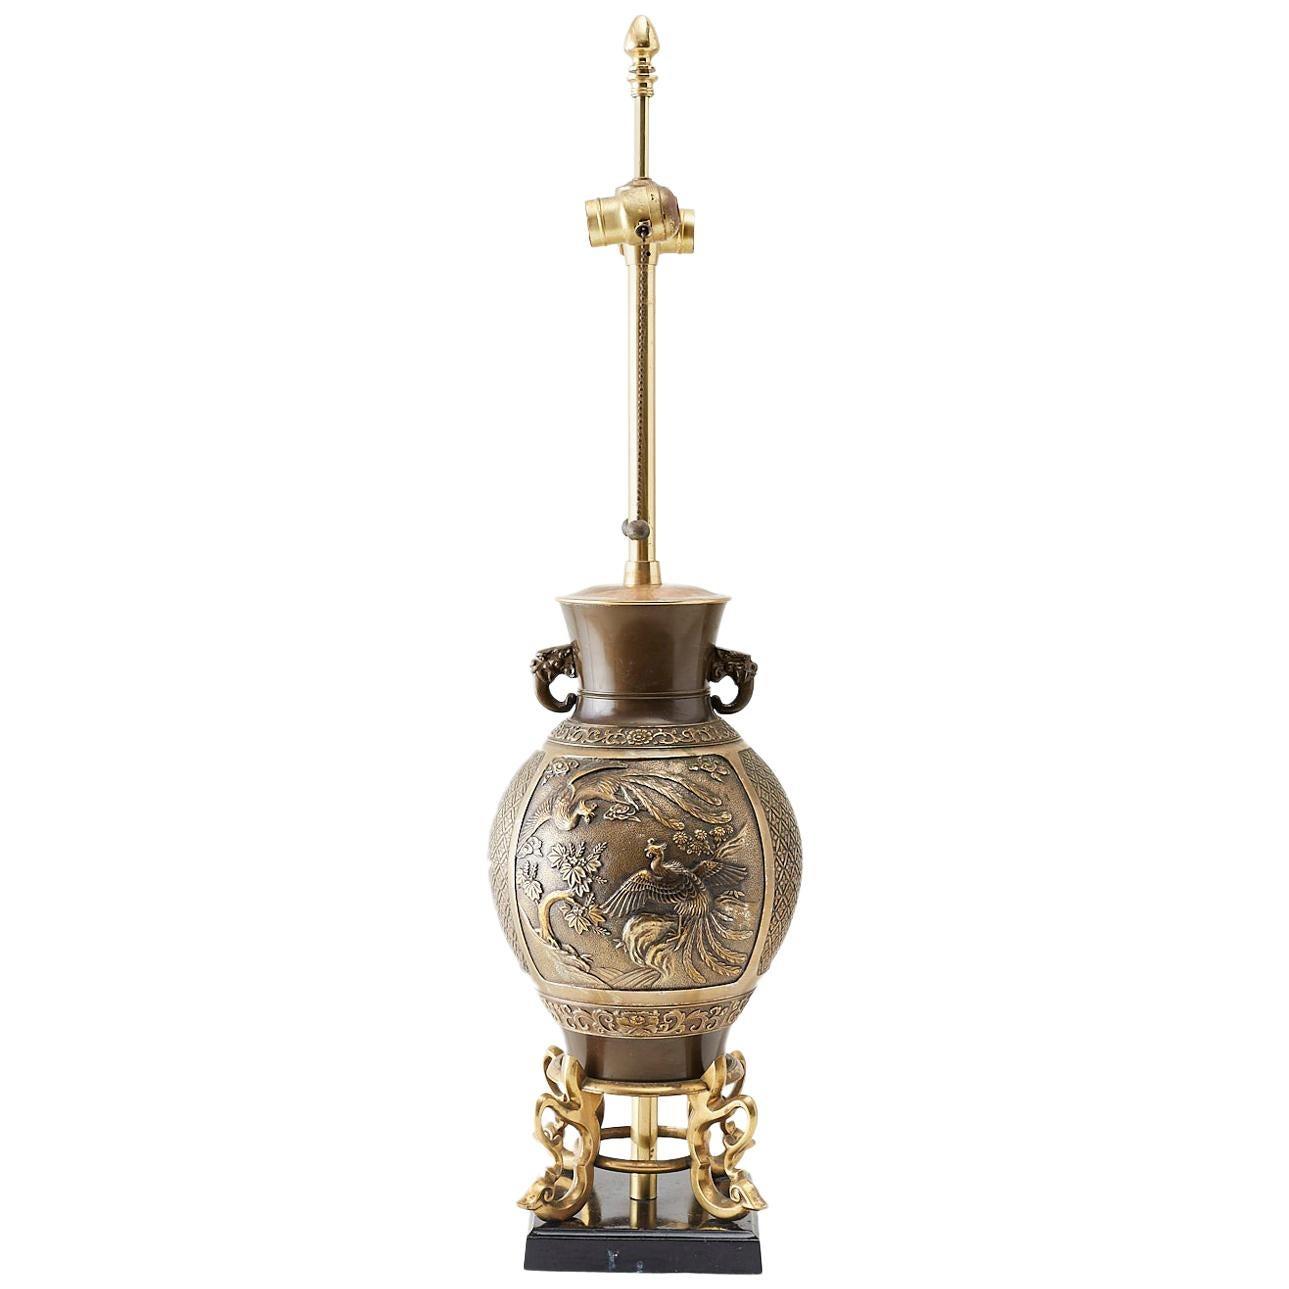 Japanese Bronze Urn Vase Mounted as Table Lamp